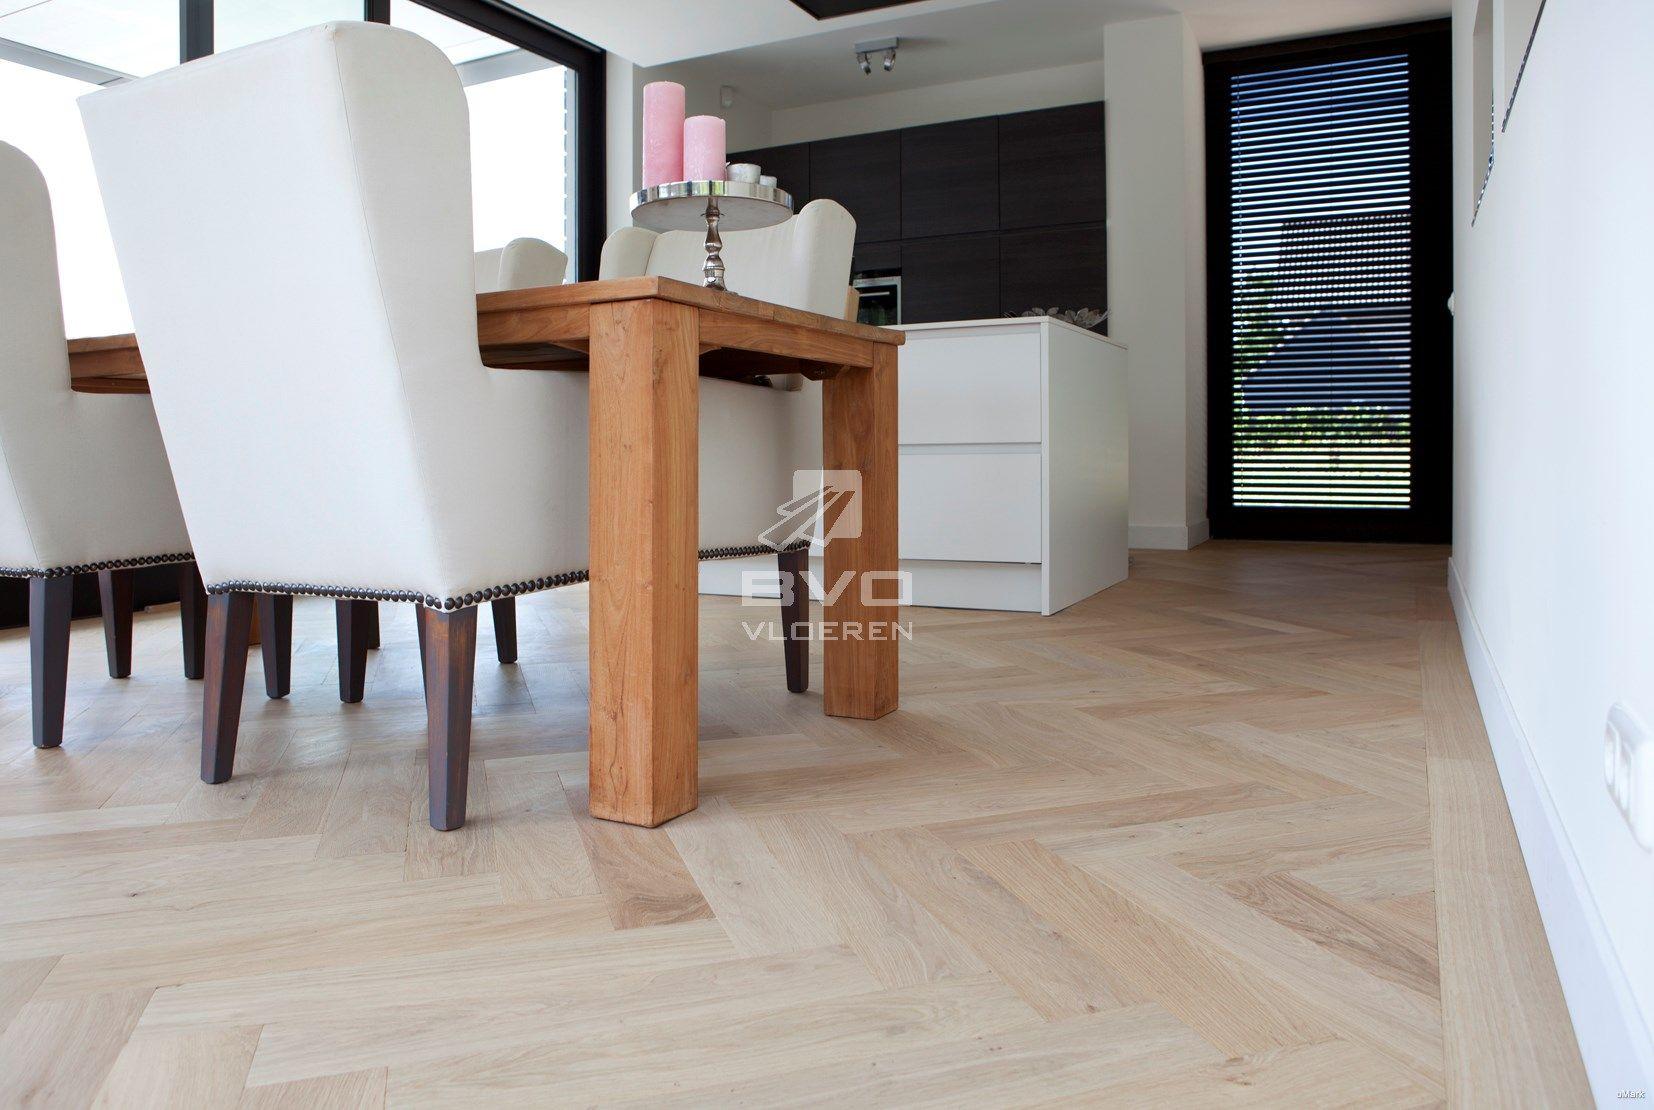 Visgraat Vloer Keuken : Visgraat vloer gelakt onbehandelde uitstraling stoere houten